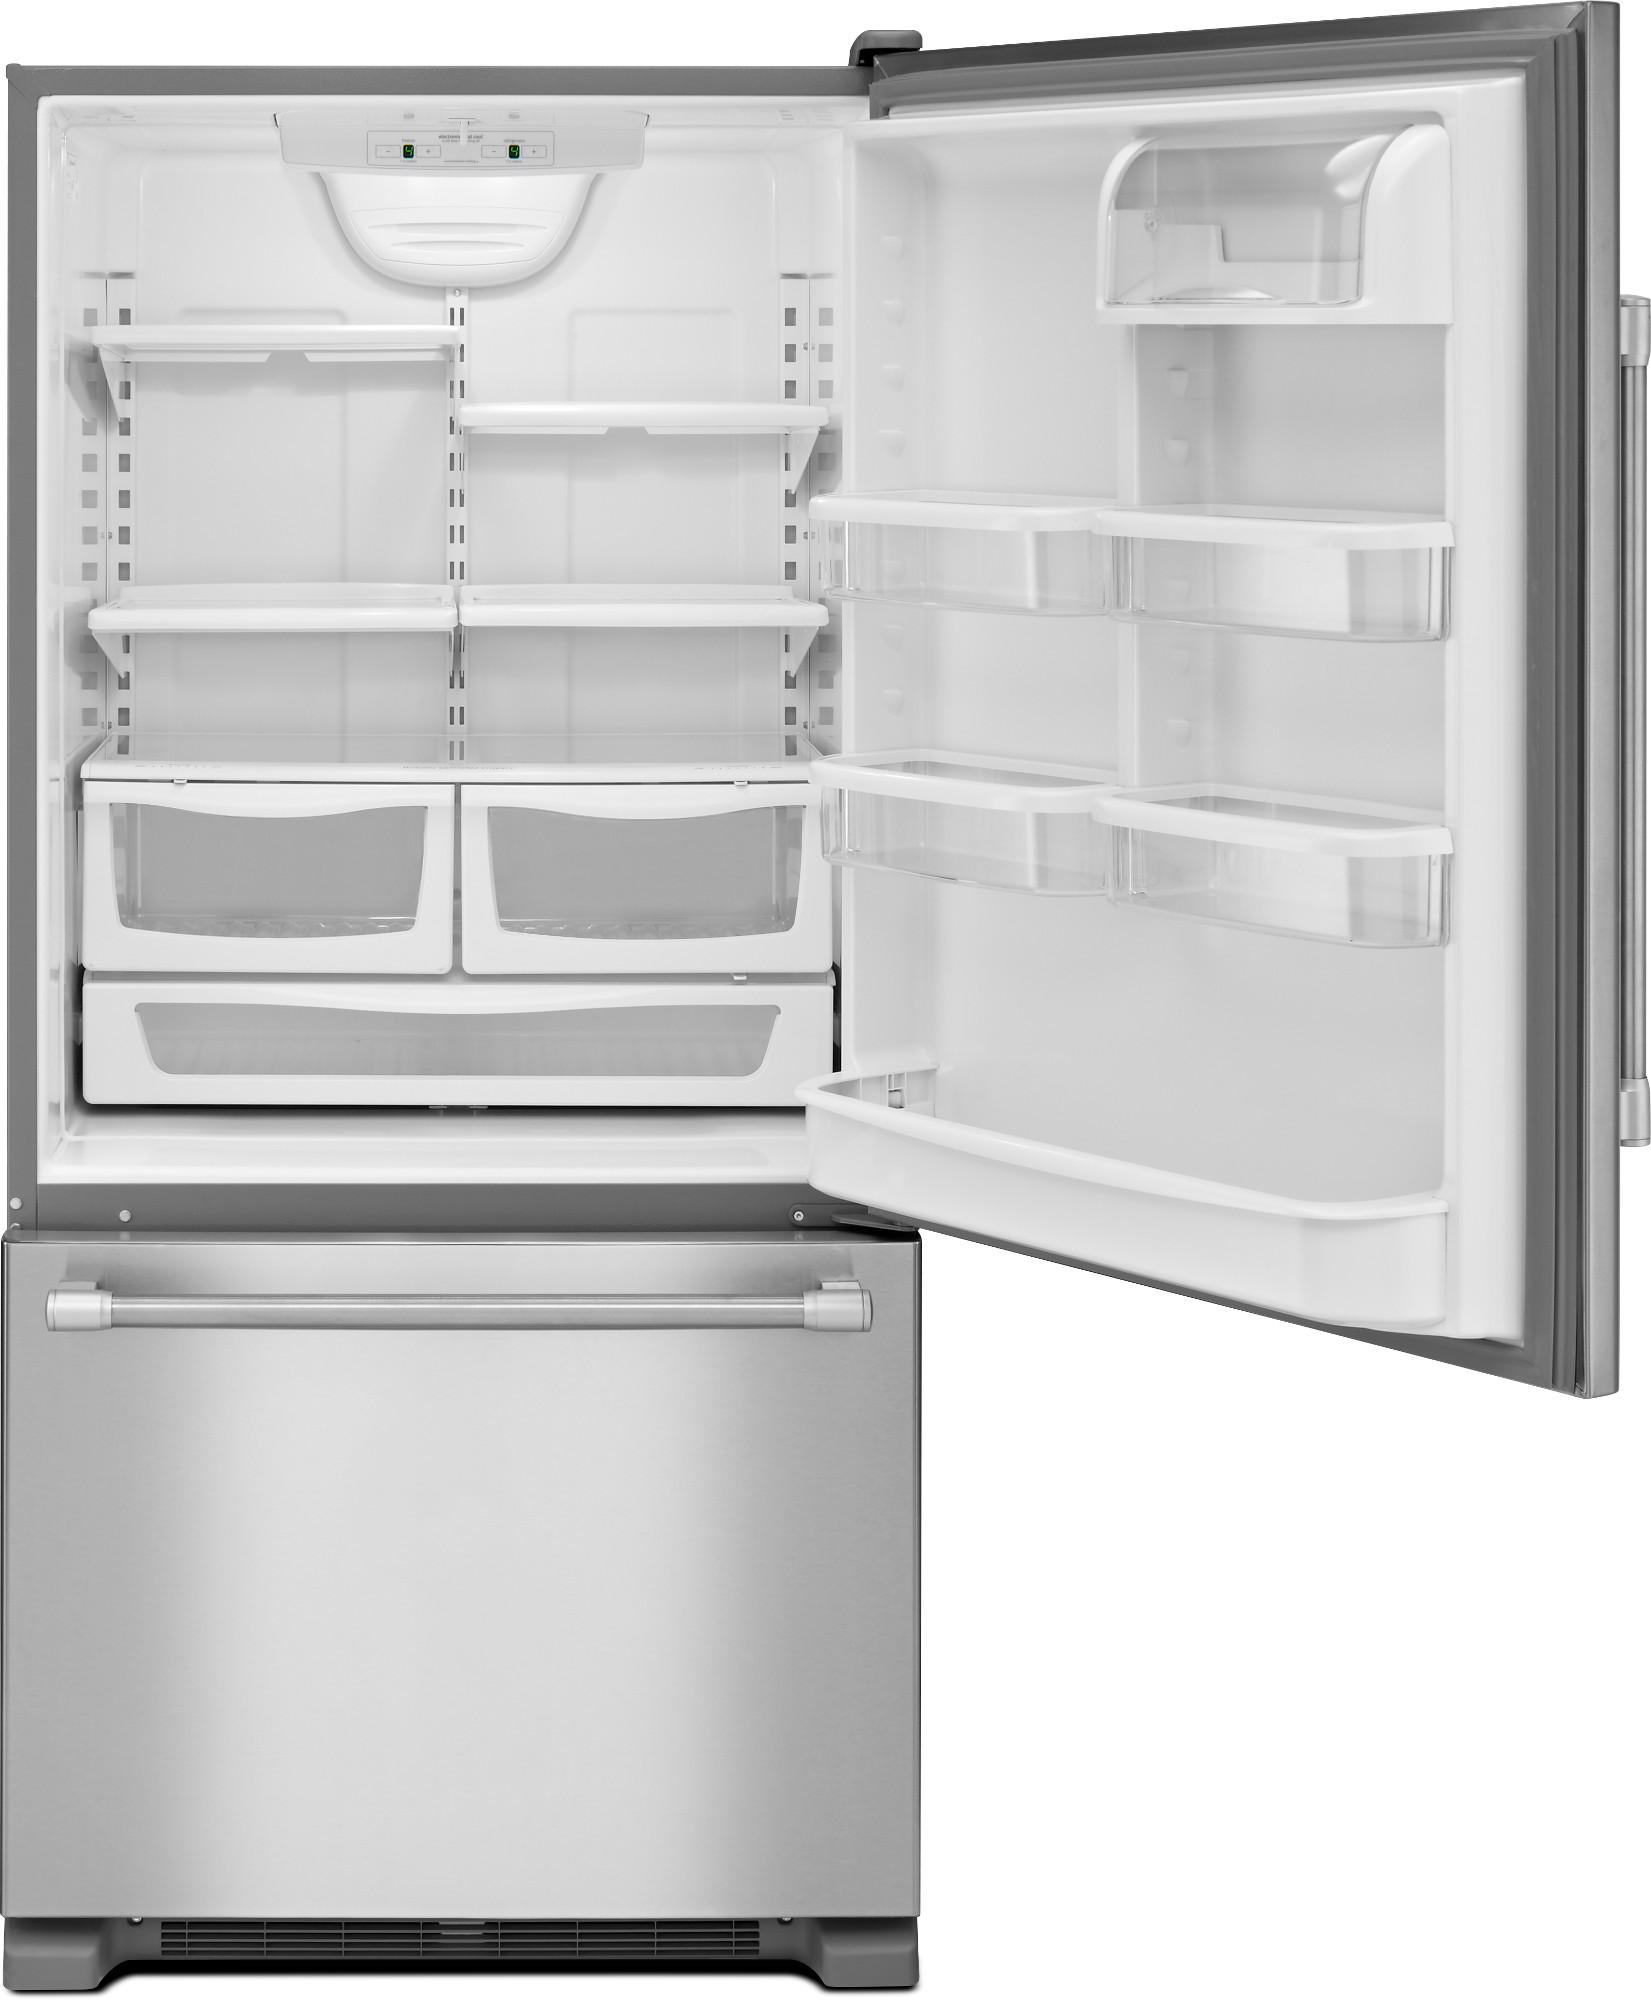 Maytag MBF2258DEM 22 cu. ft. Single Door Bottom Freezer Refrigerator - Stainless Steel